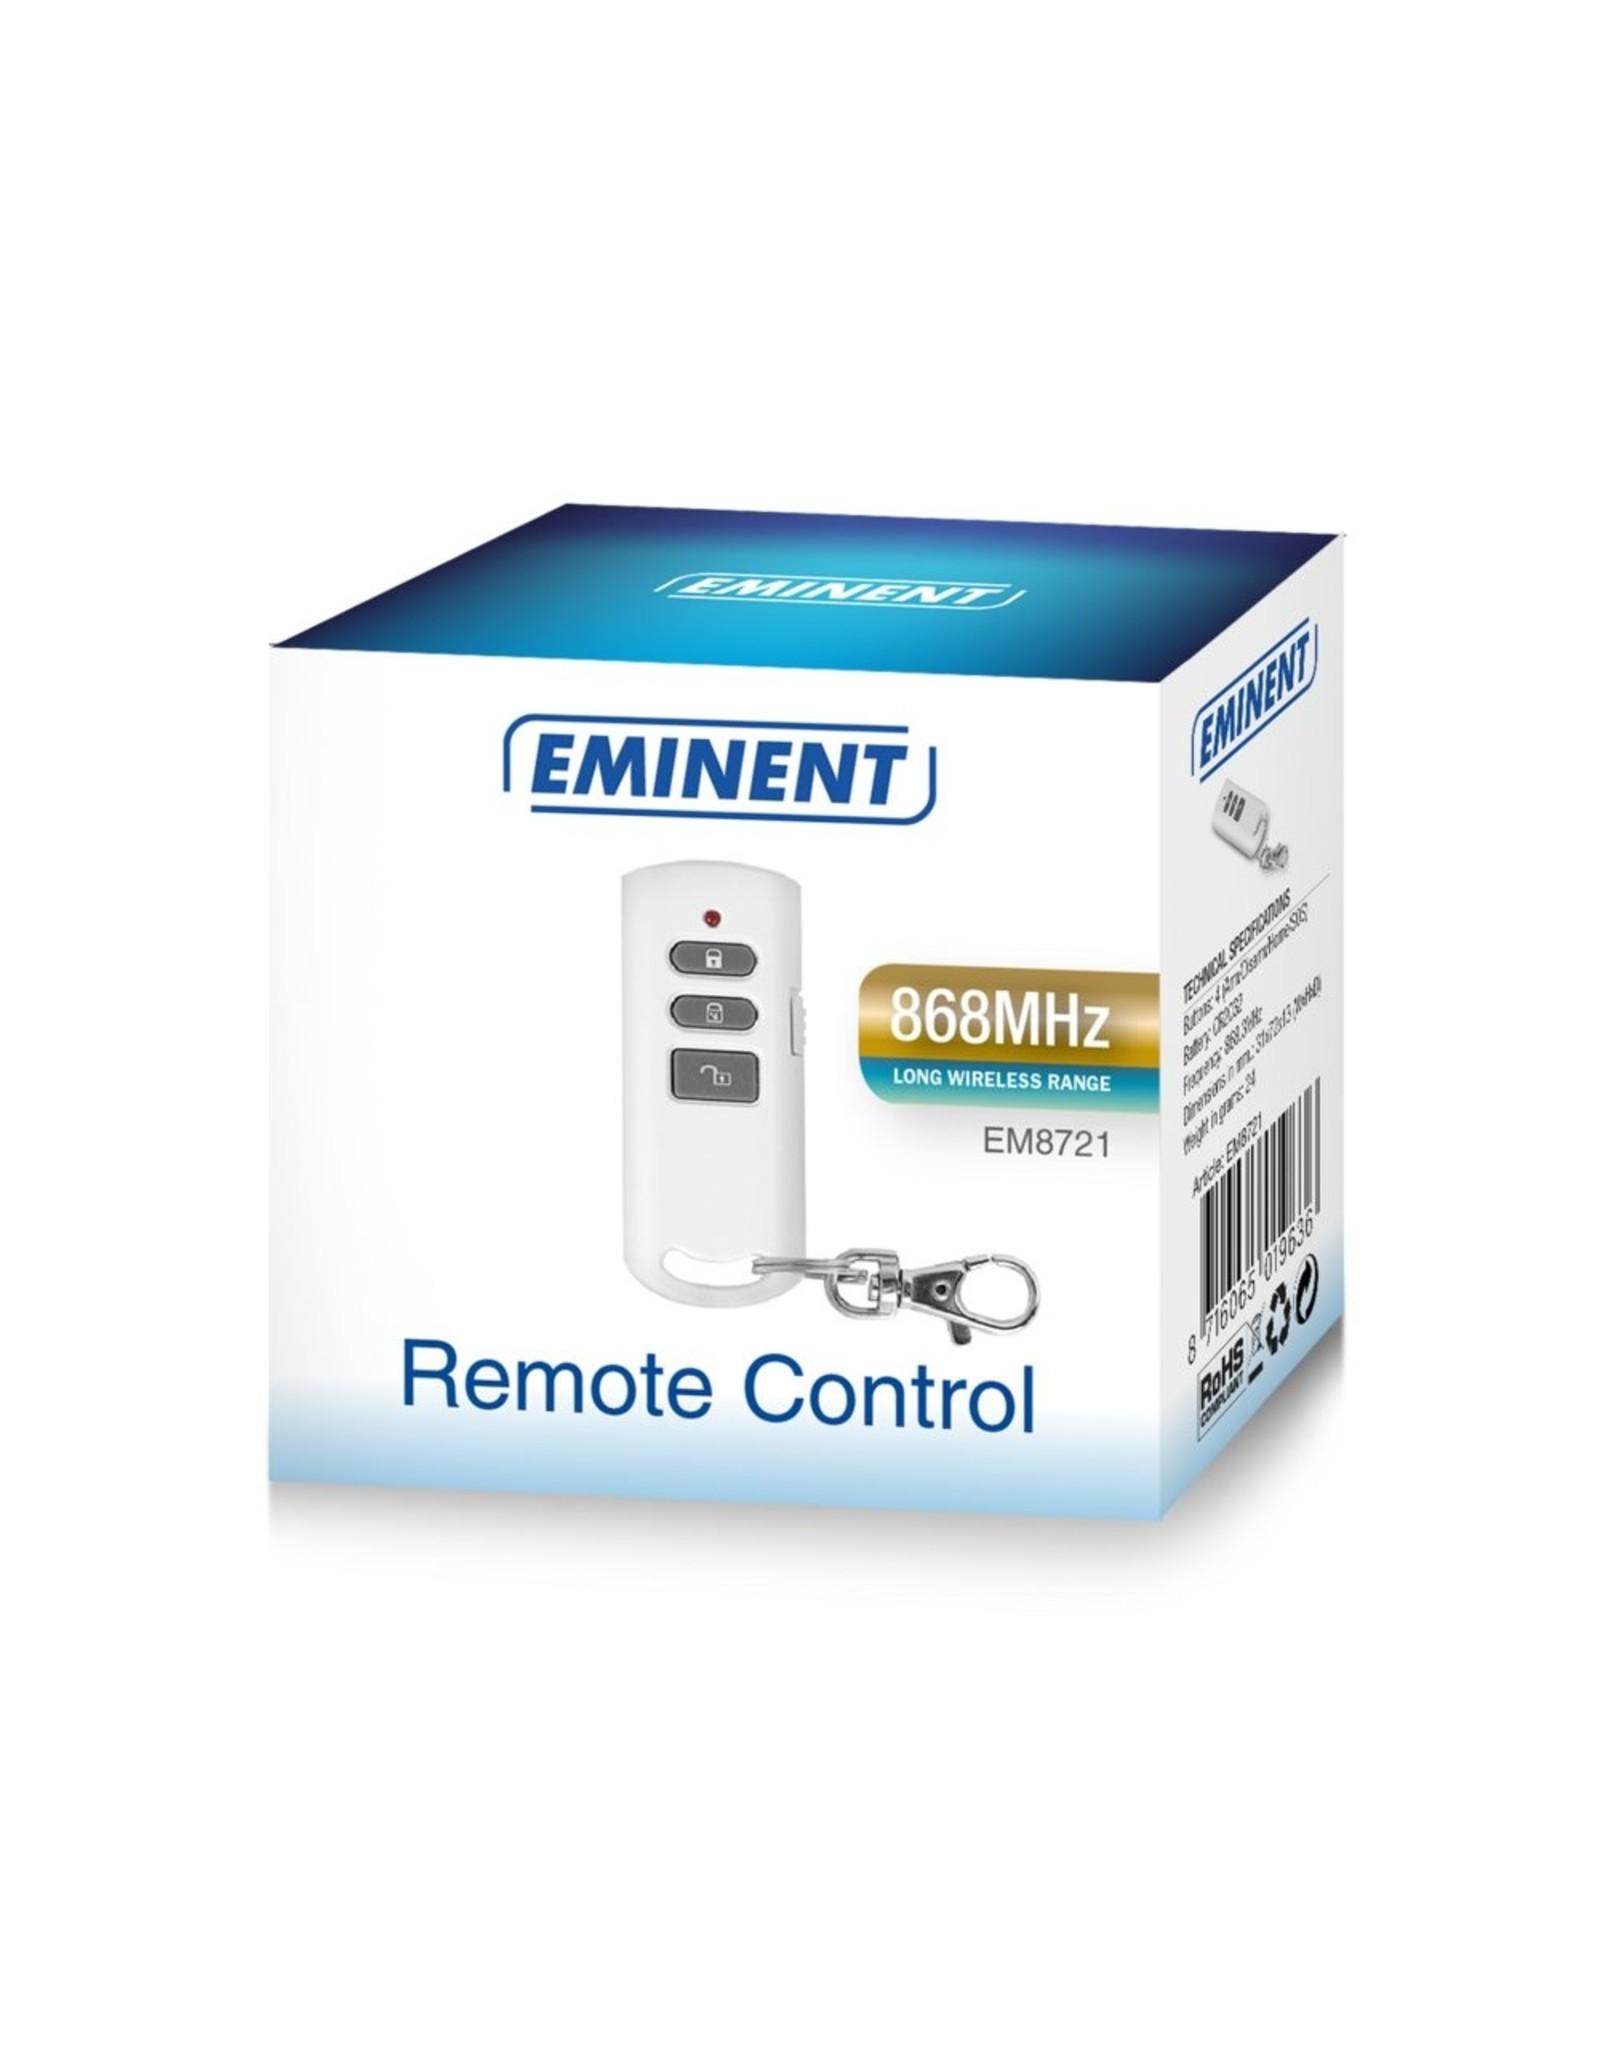 Eminent Remote control 868MHz wireless alarm system